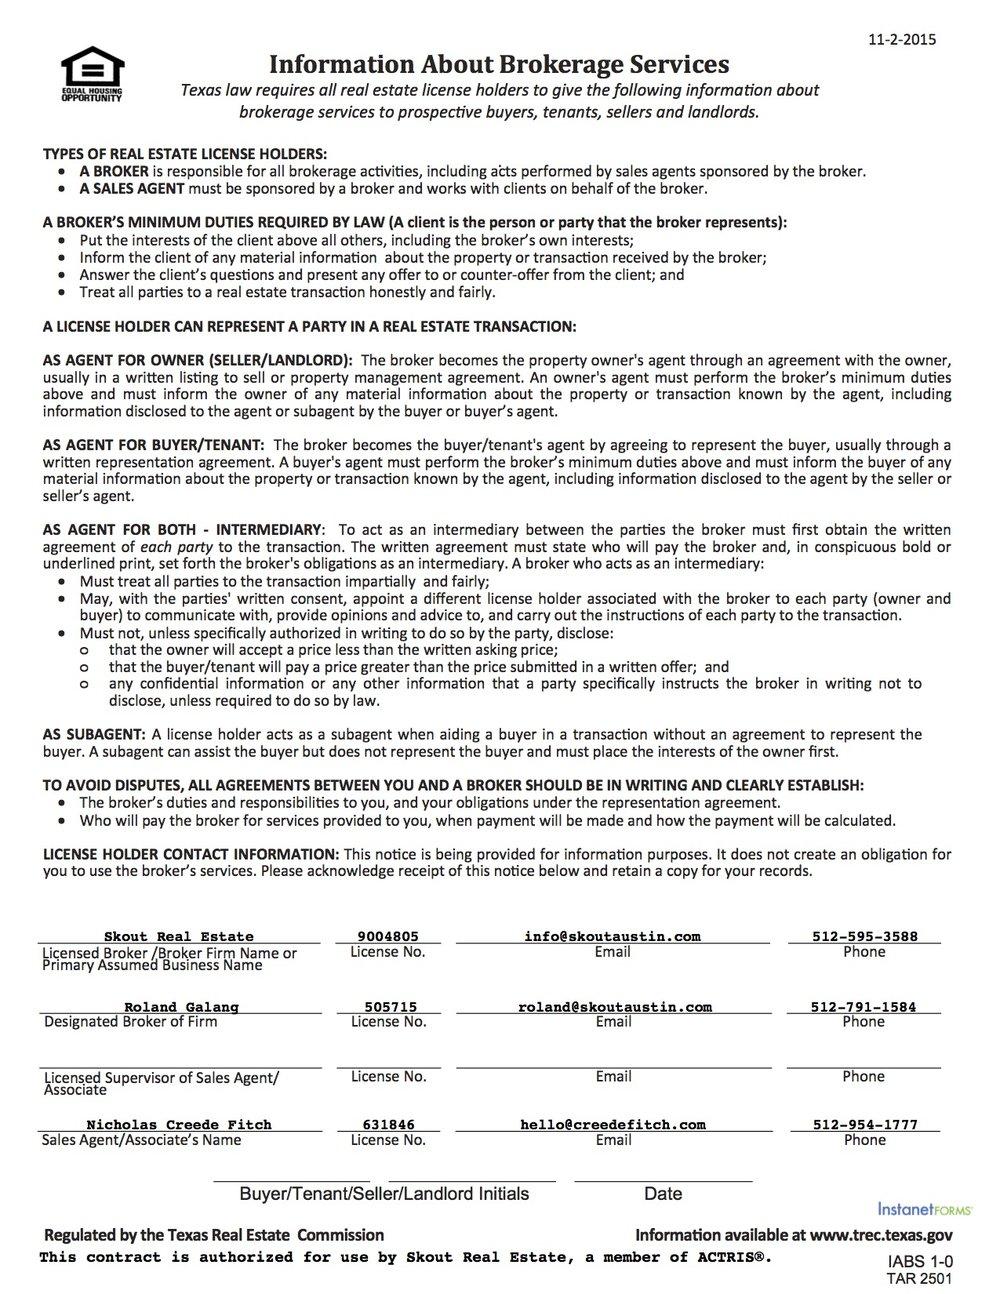 Information About Brokerage Services (TAR-2501).jpg